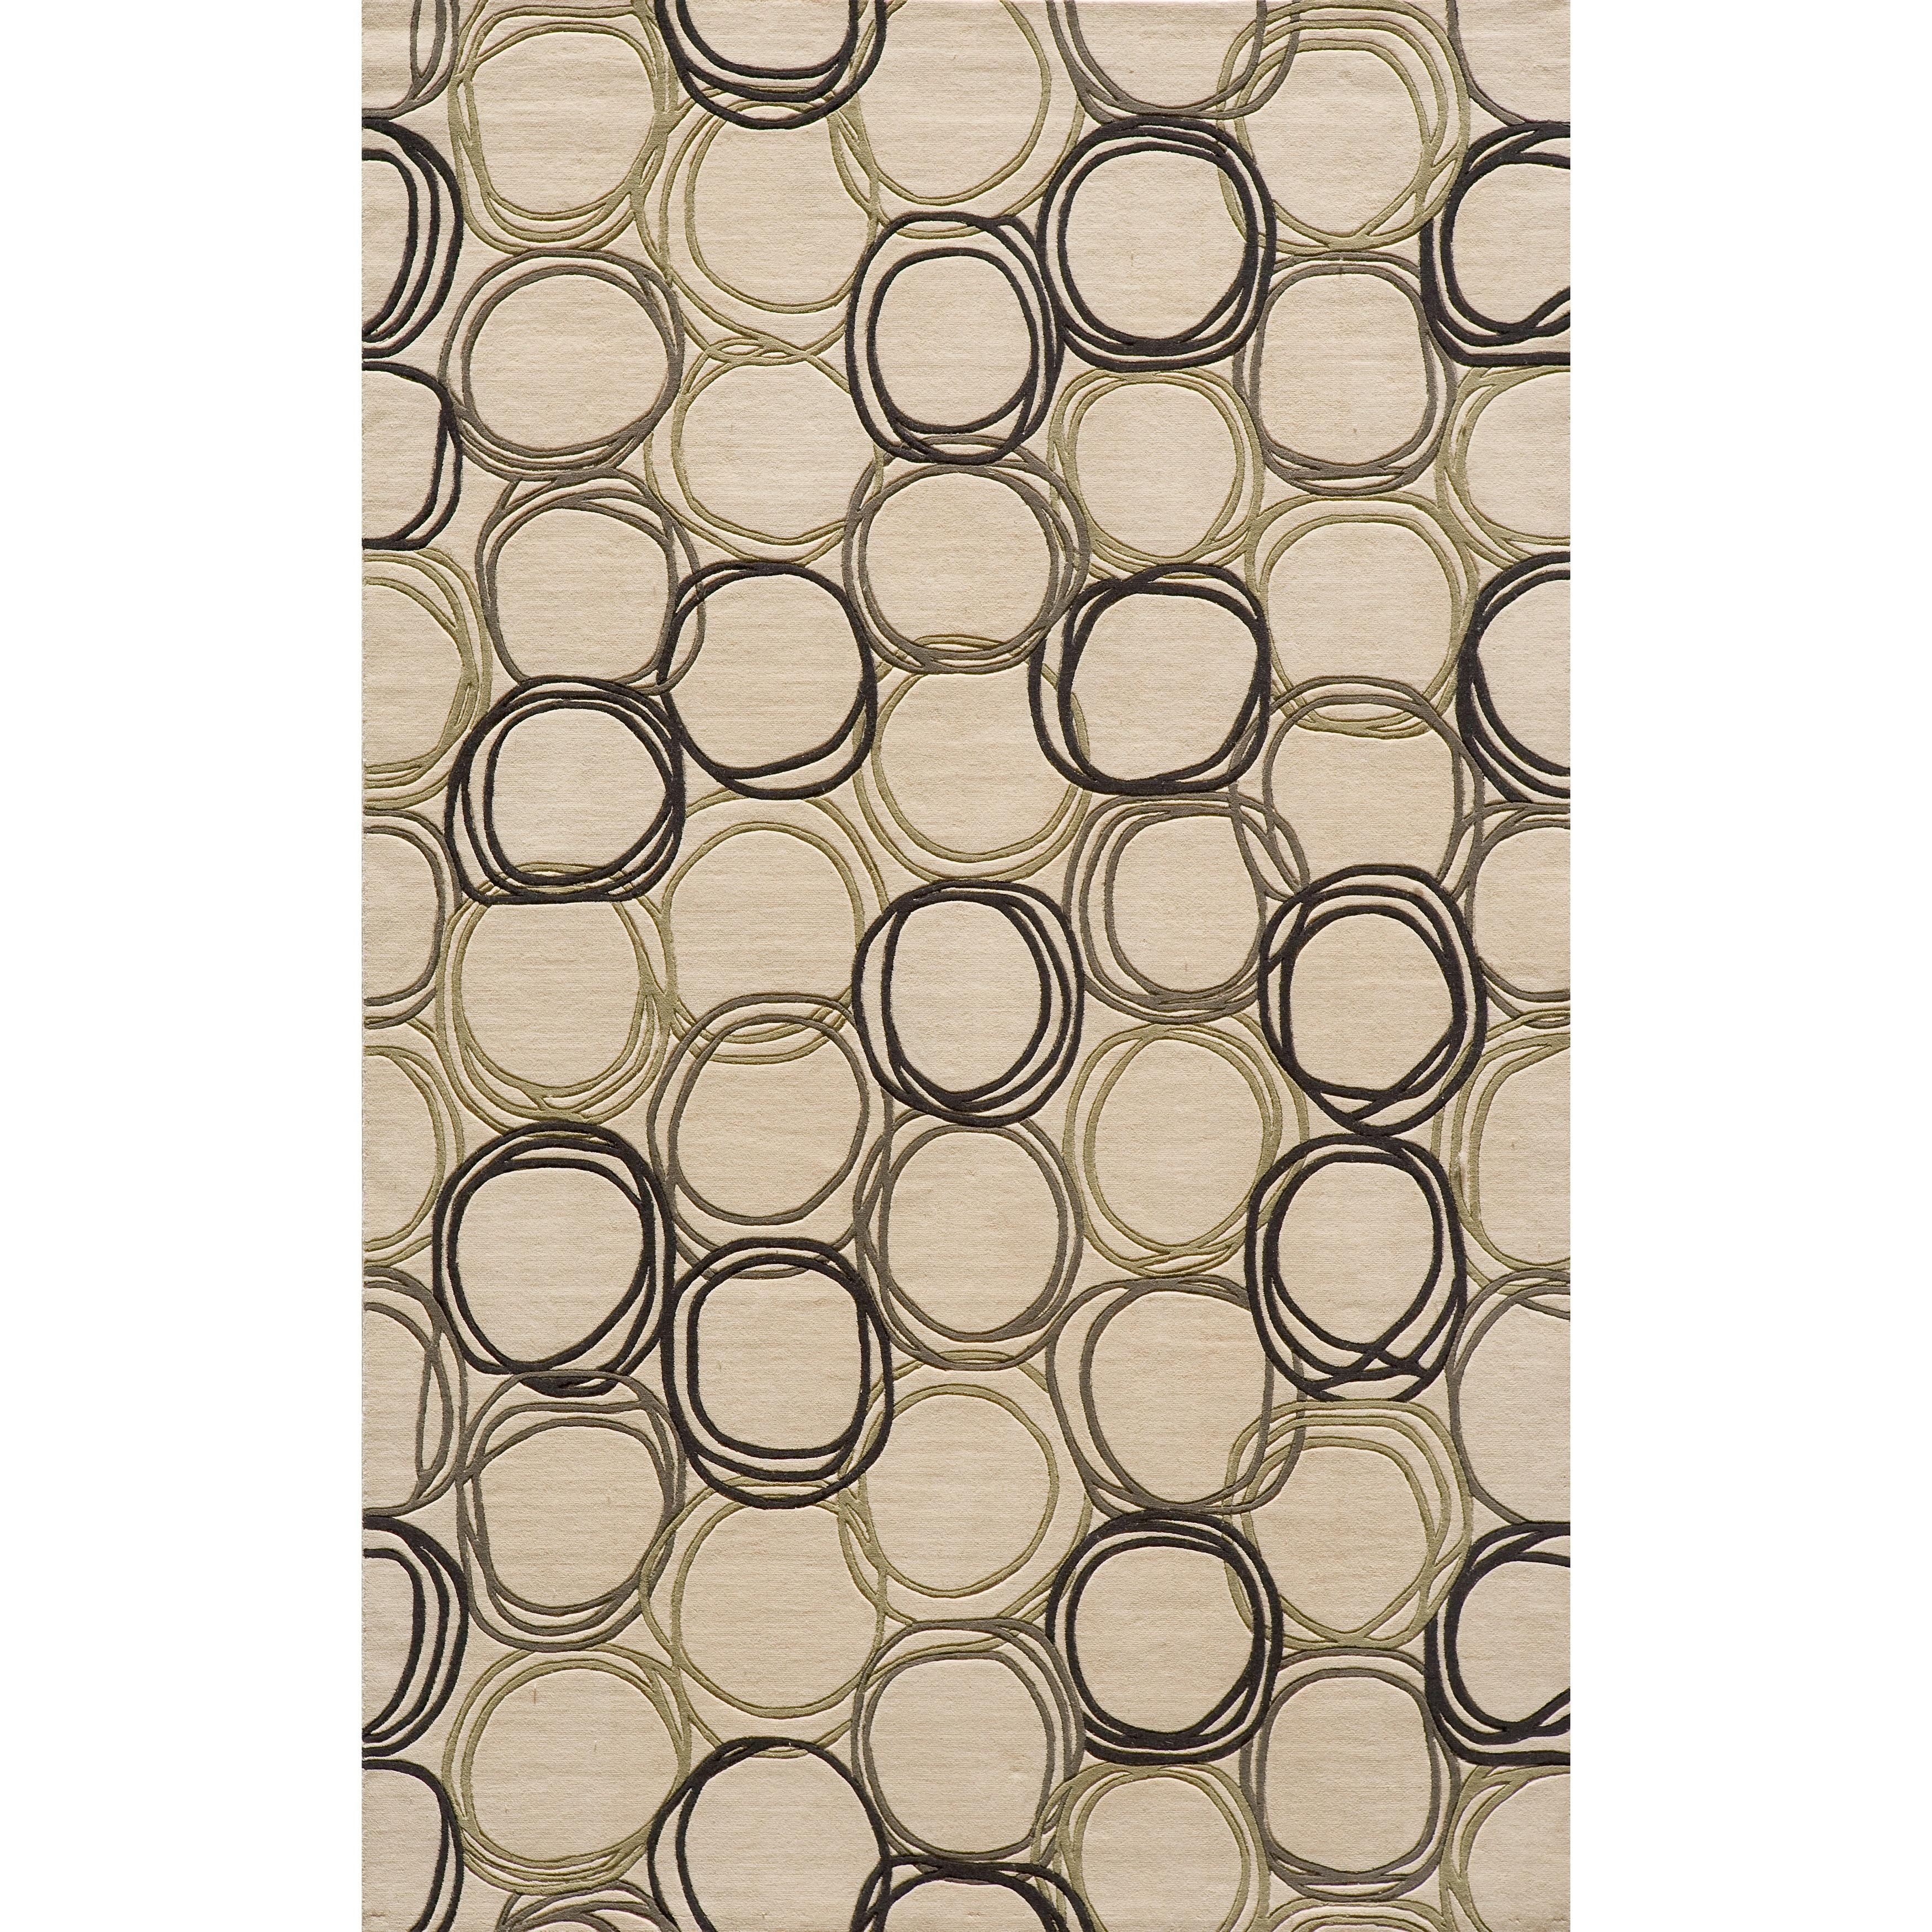 Soho Triple Circles Power-Loomed Ivory Wool Rug (8' x 11')